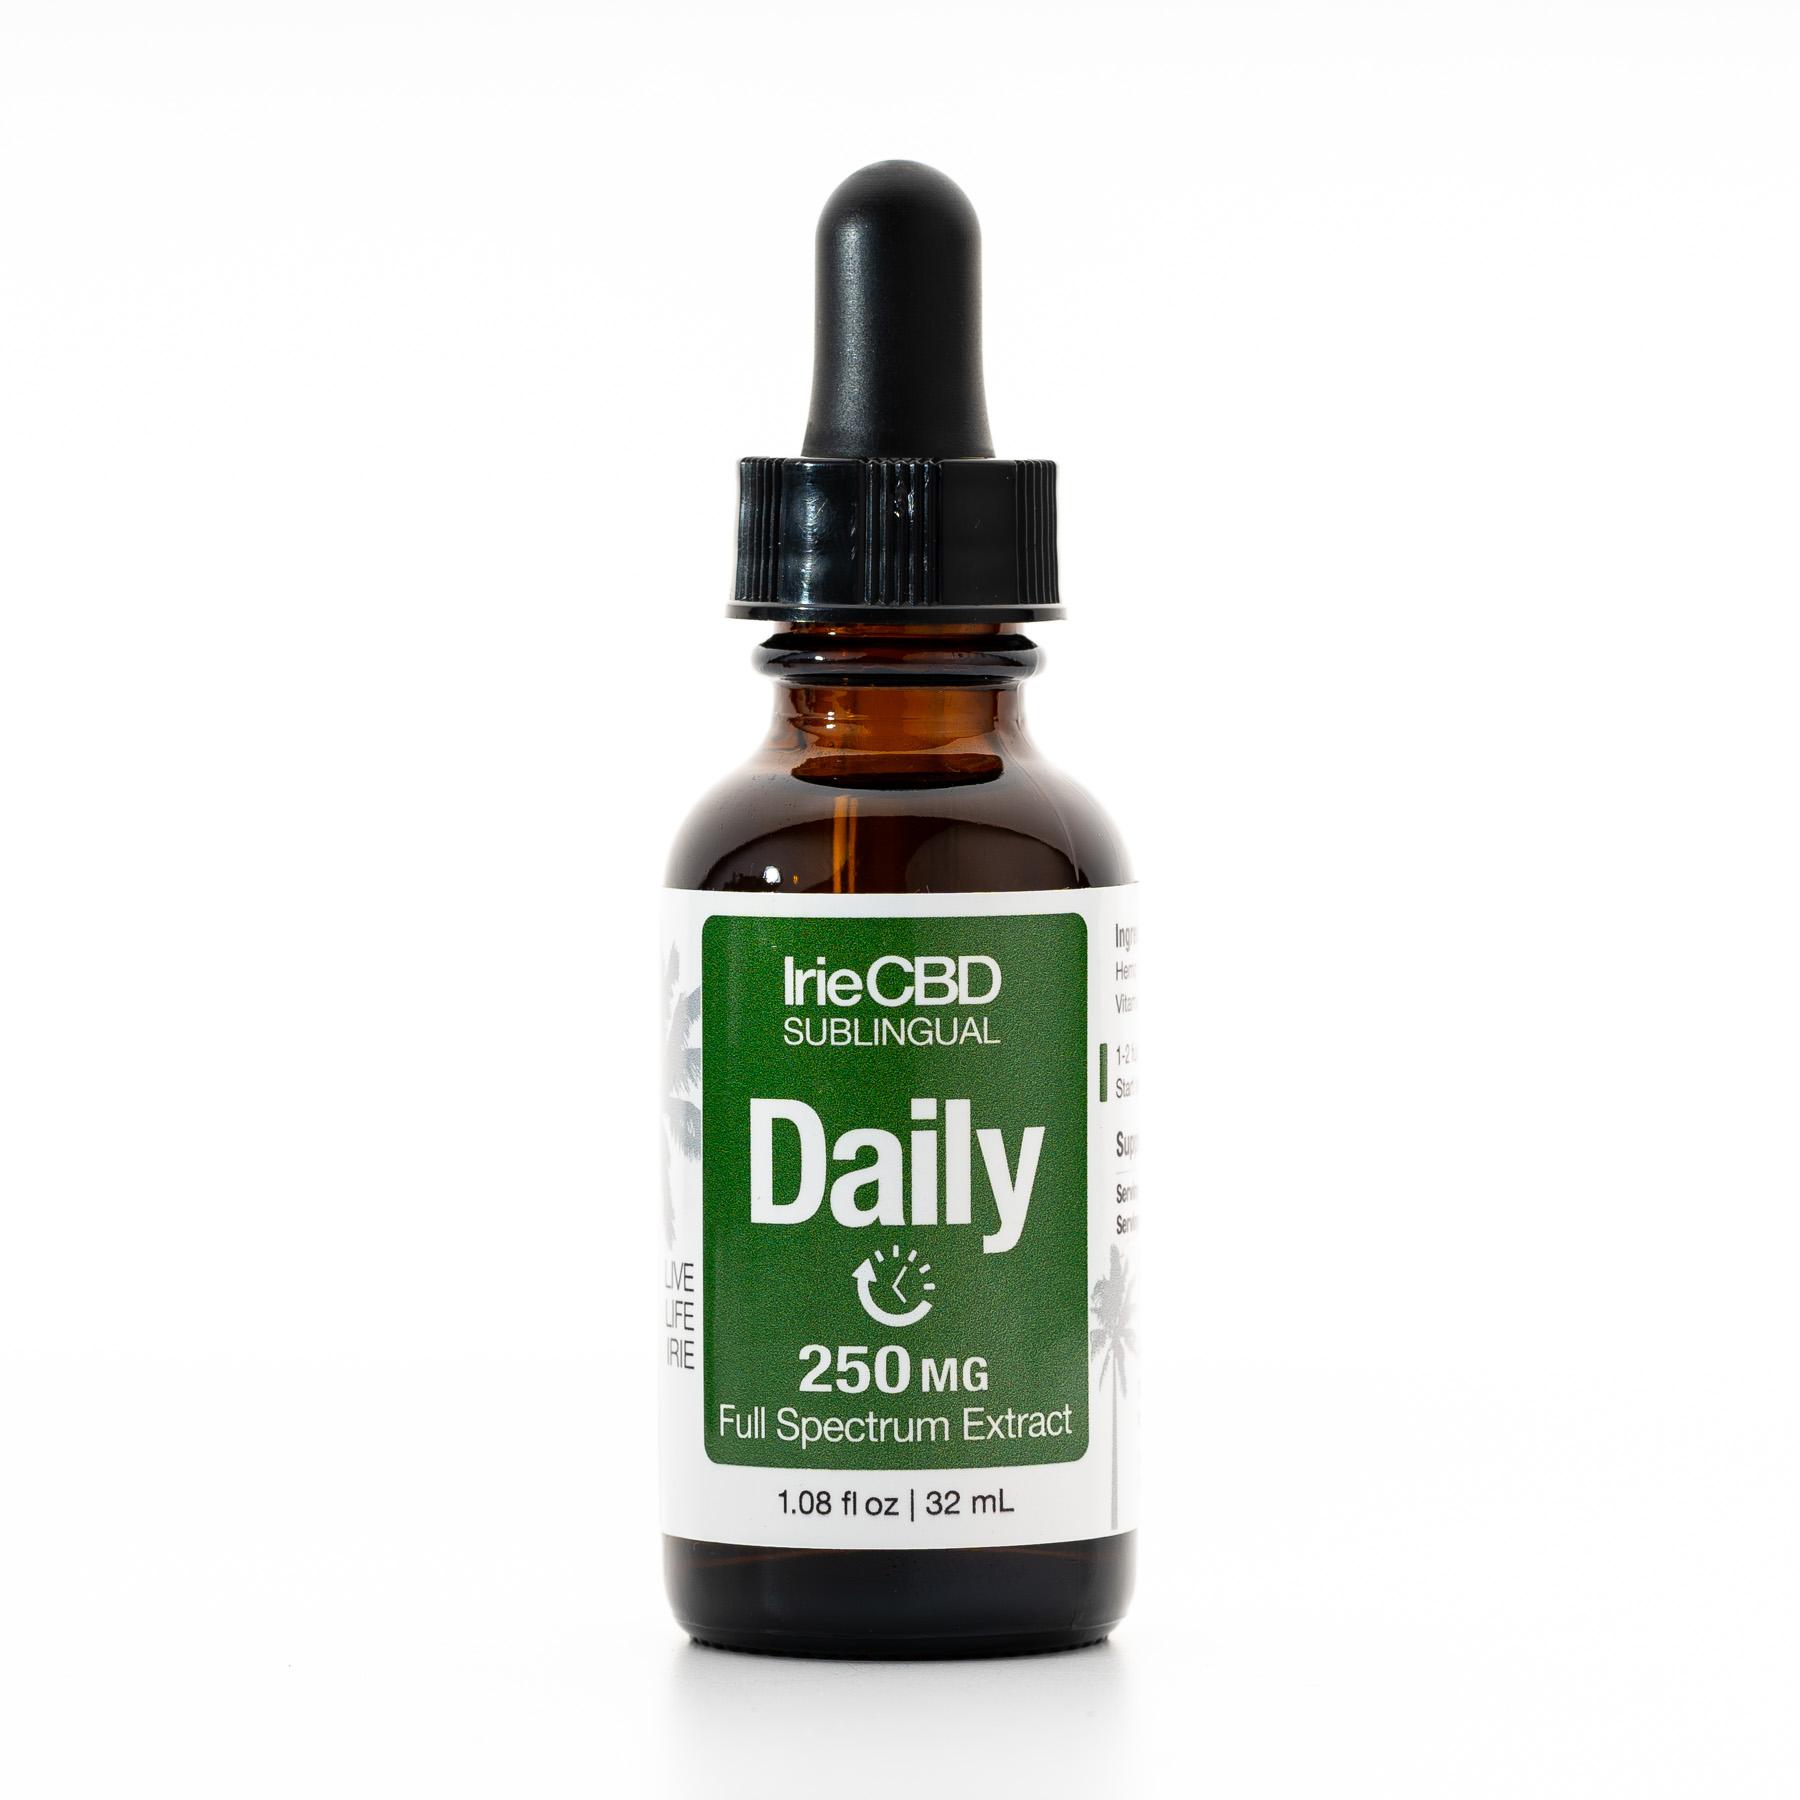 Daily 250mg CBD Oil Tincture Irie CBD